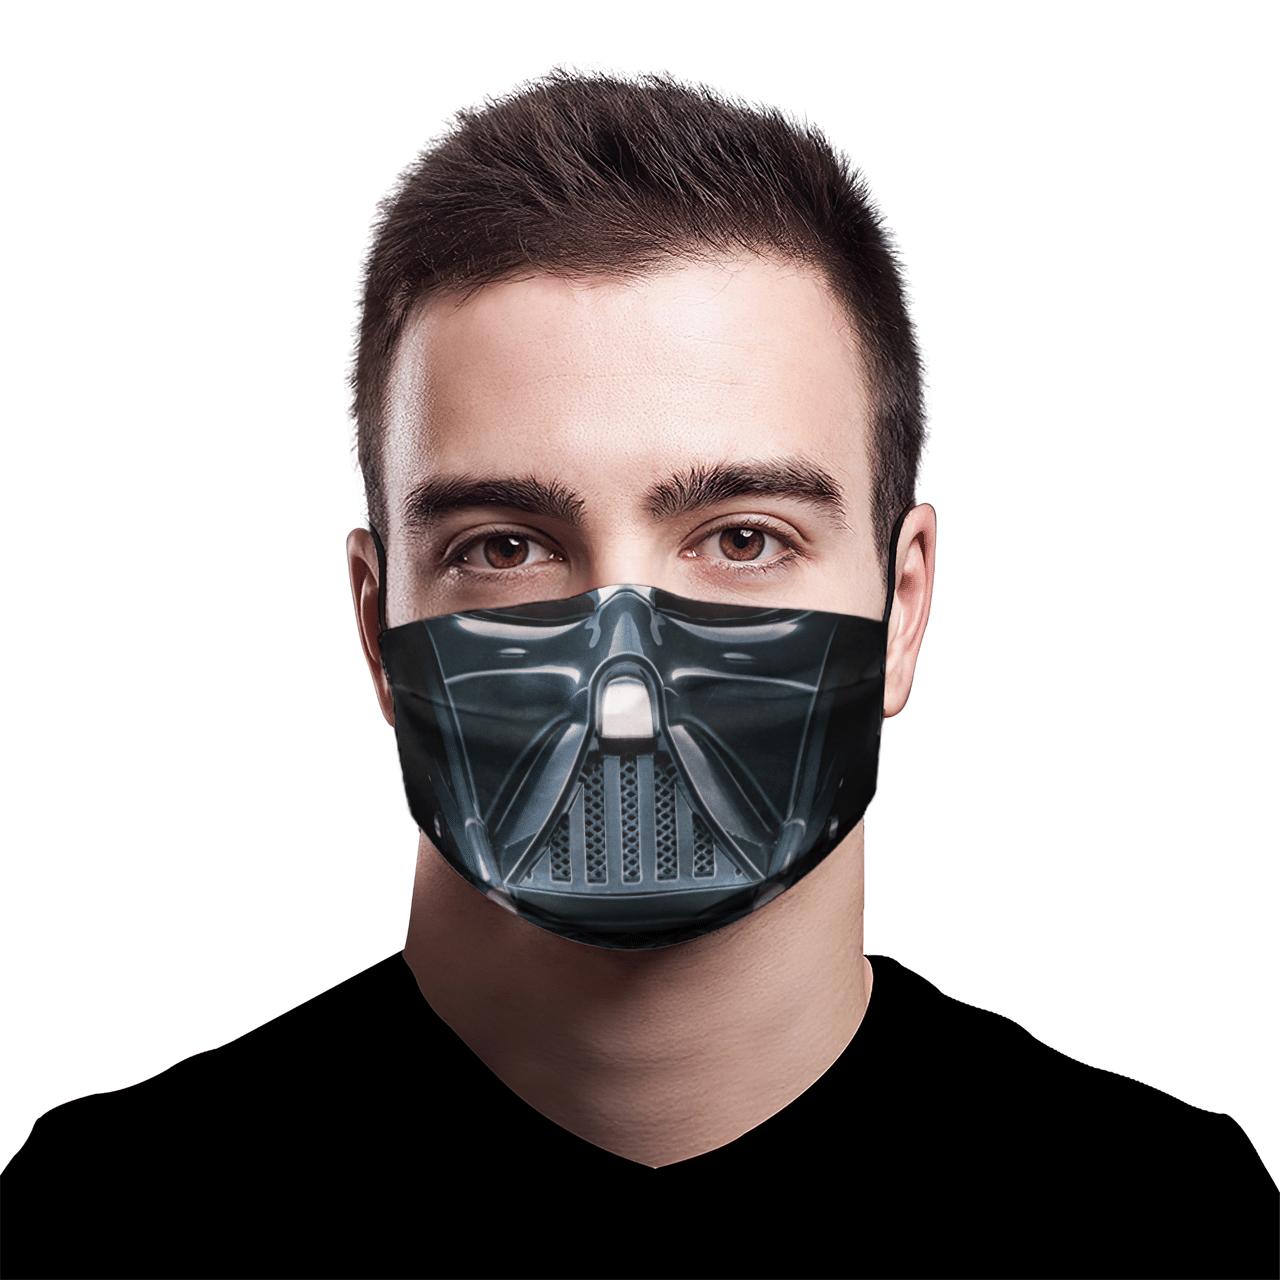 Star Wars Darth Vader 3D face mask